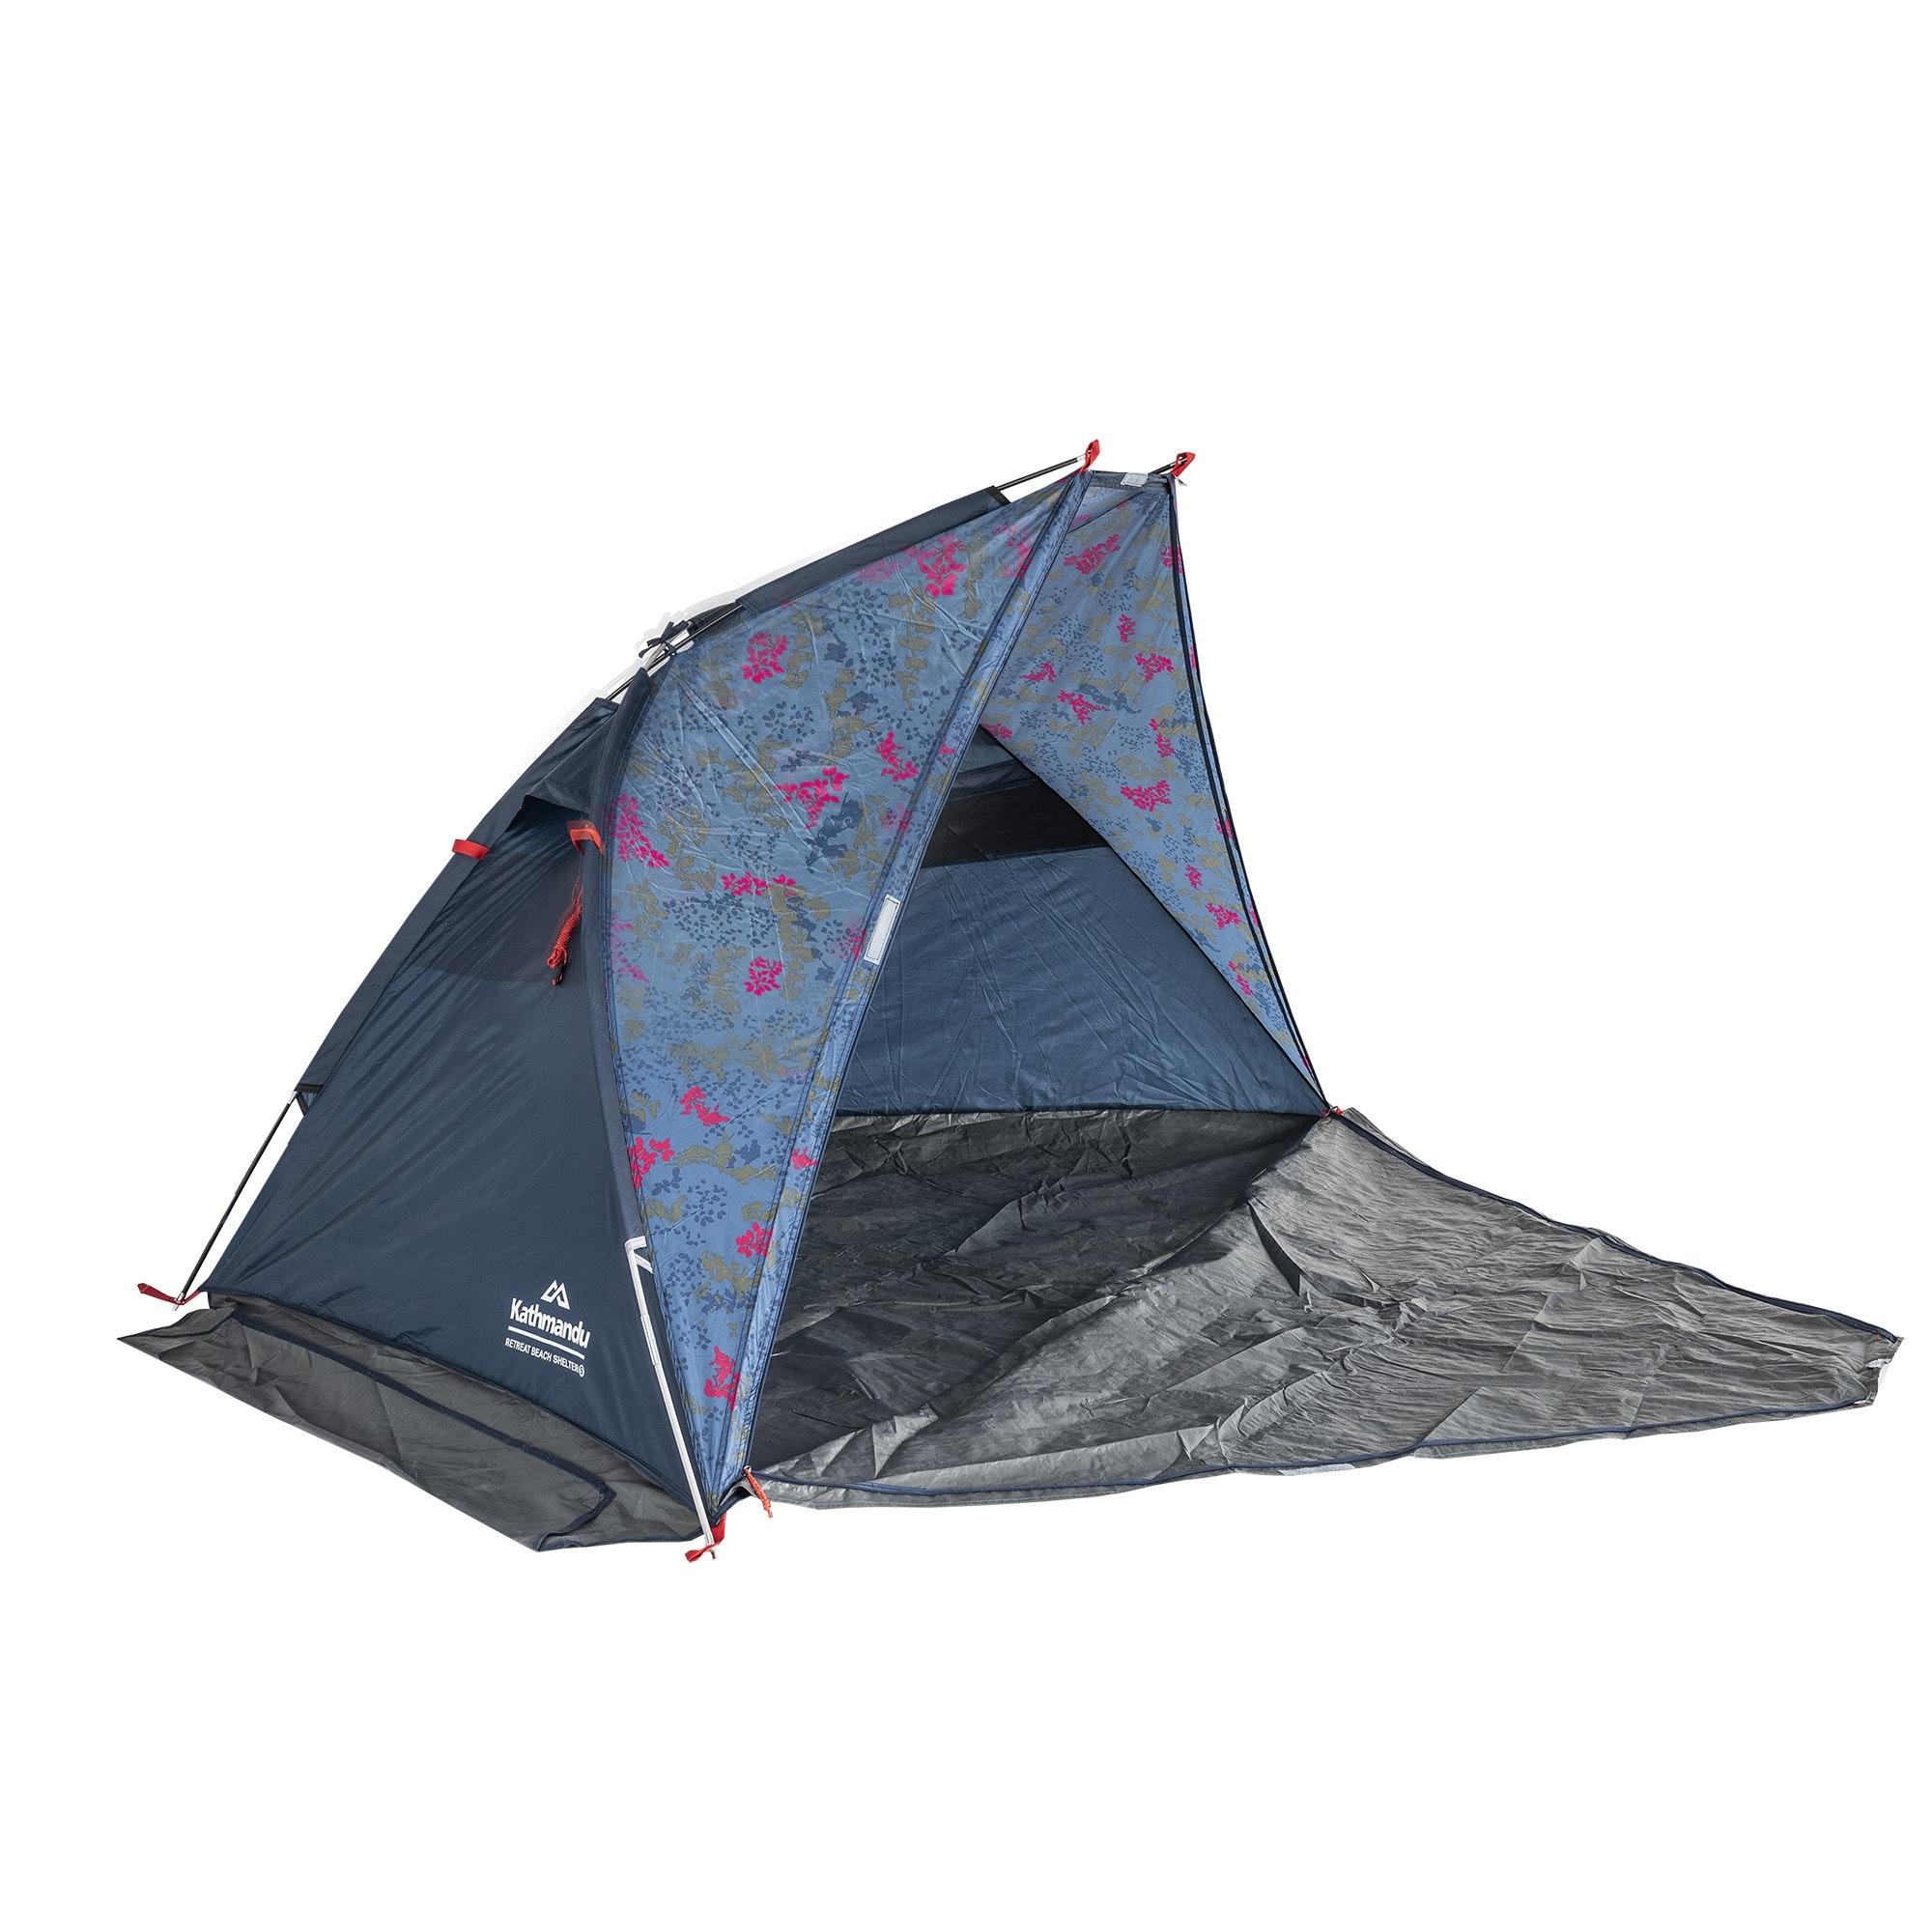 Retreat 3 Person Beach Shelter v3  sc 1 st  Kathmandu & Tents for Sale | 23456 u0026 7 Person Tent | Kathmandu Australia